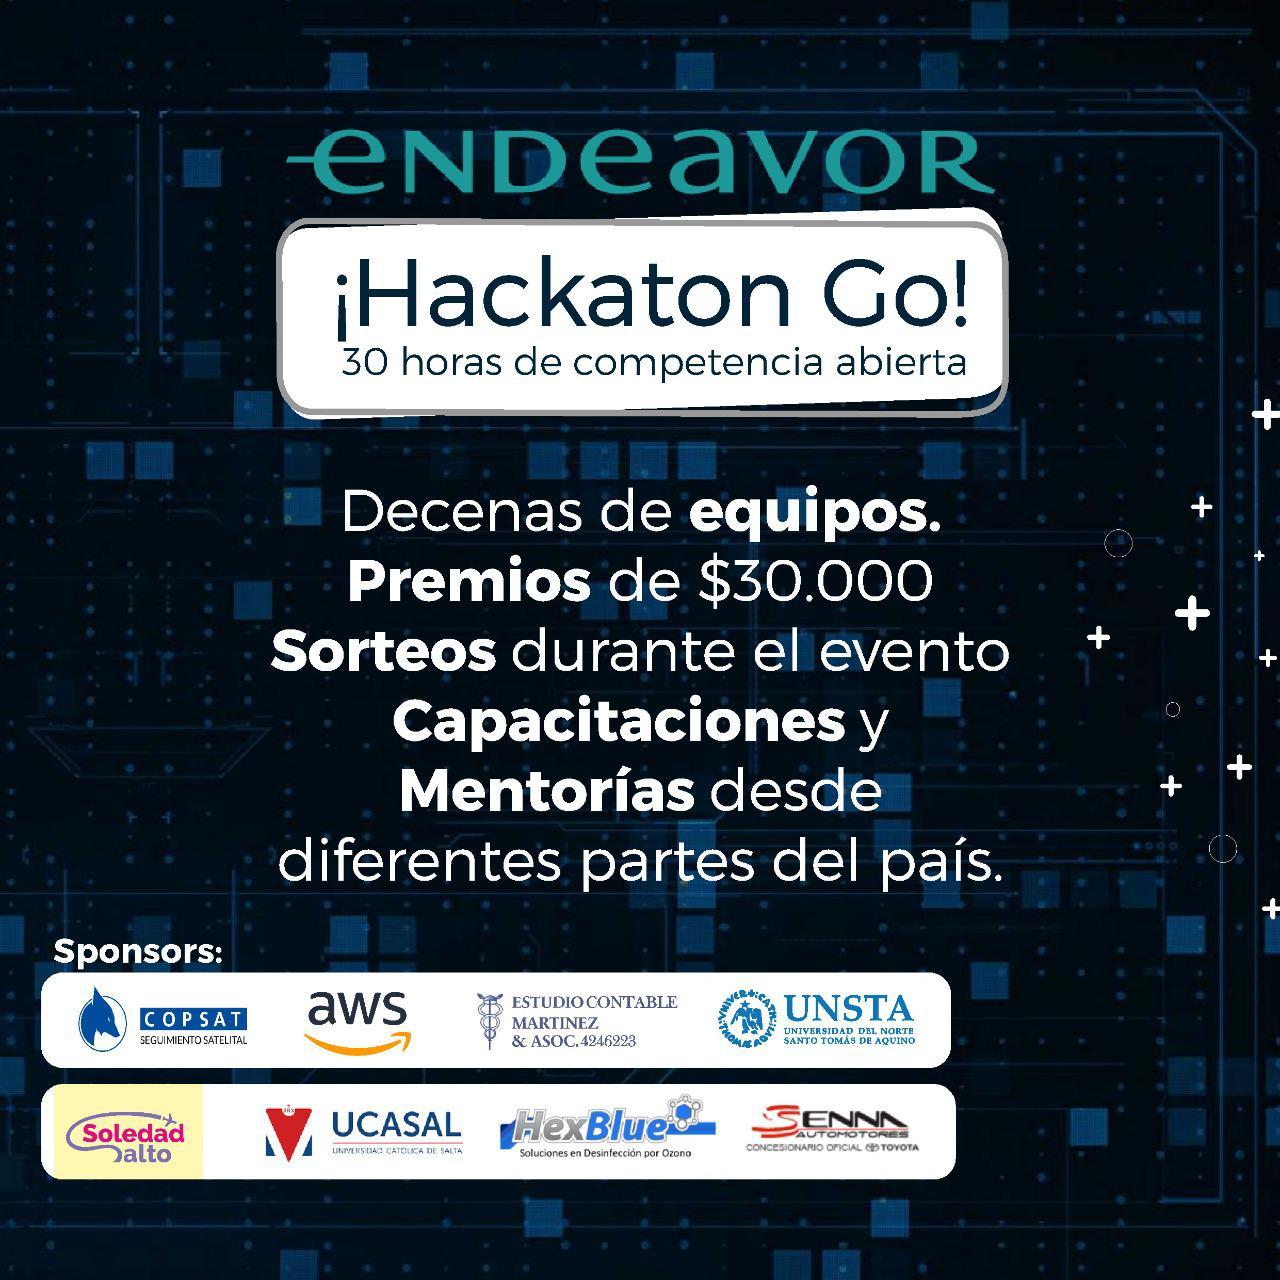 endeavor hackaton 2